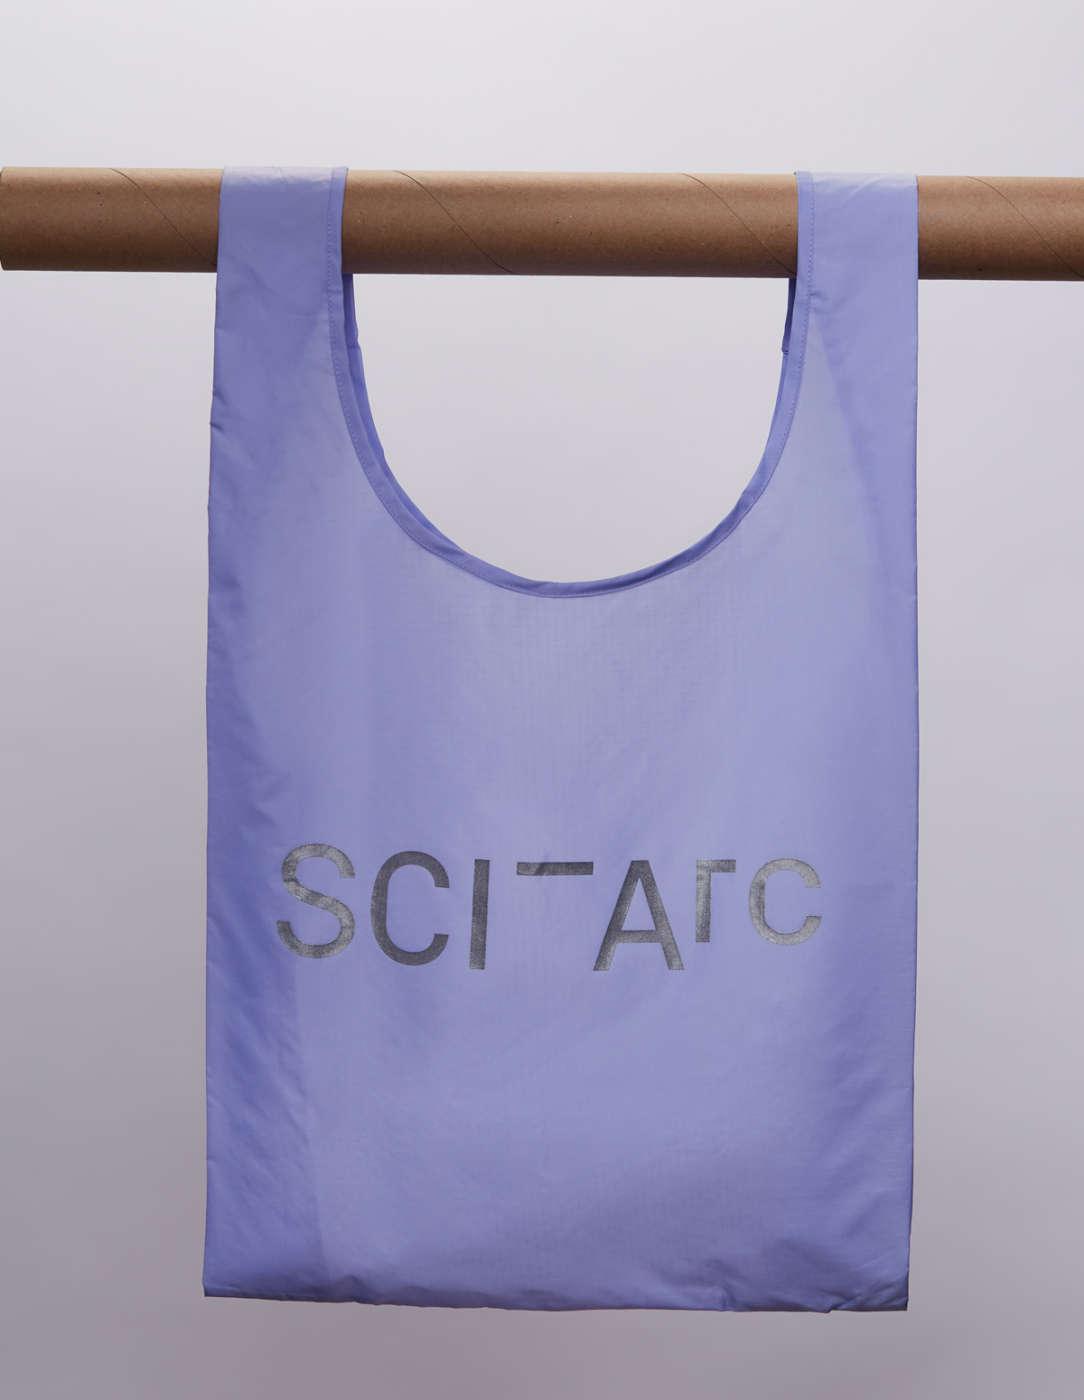 sciarc logo purple bag